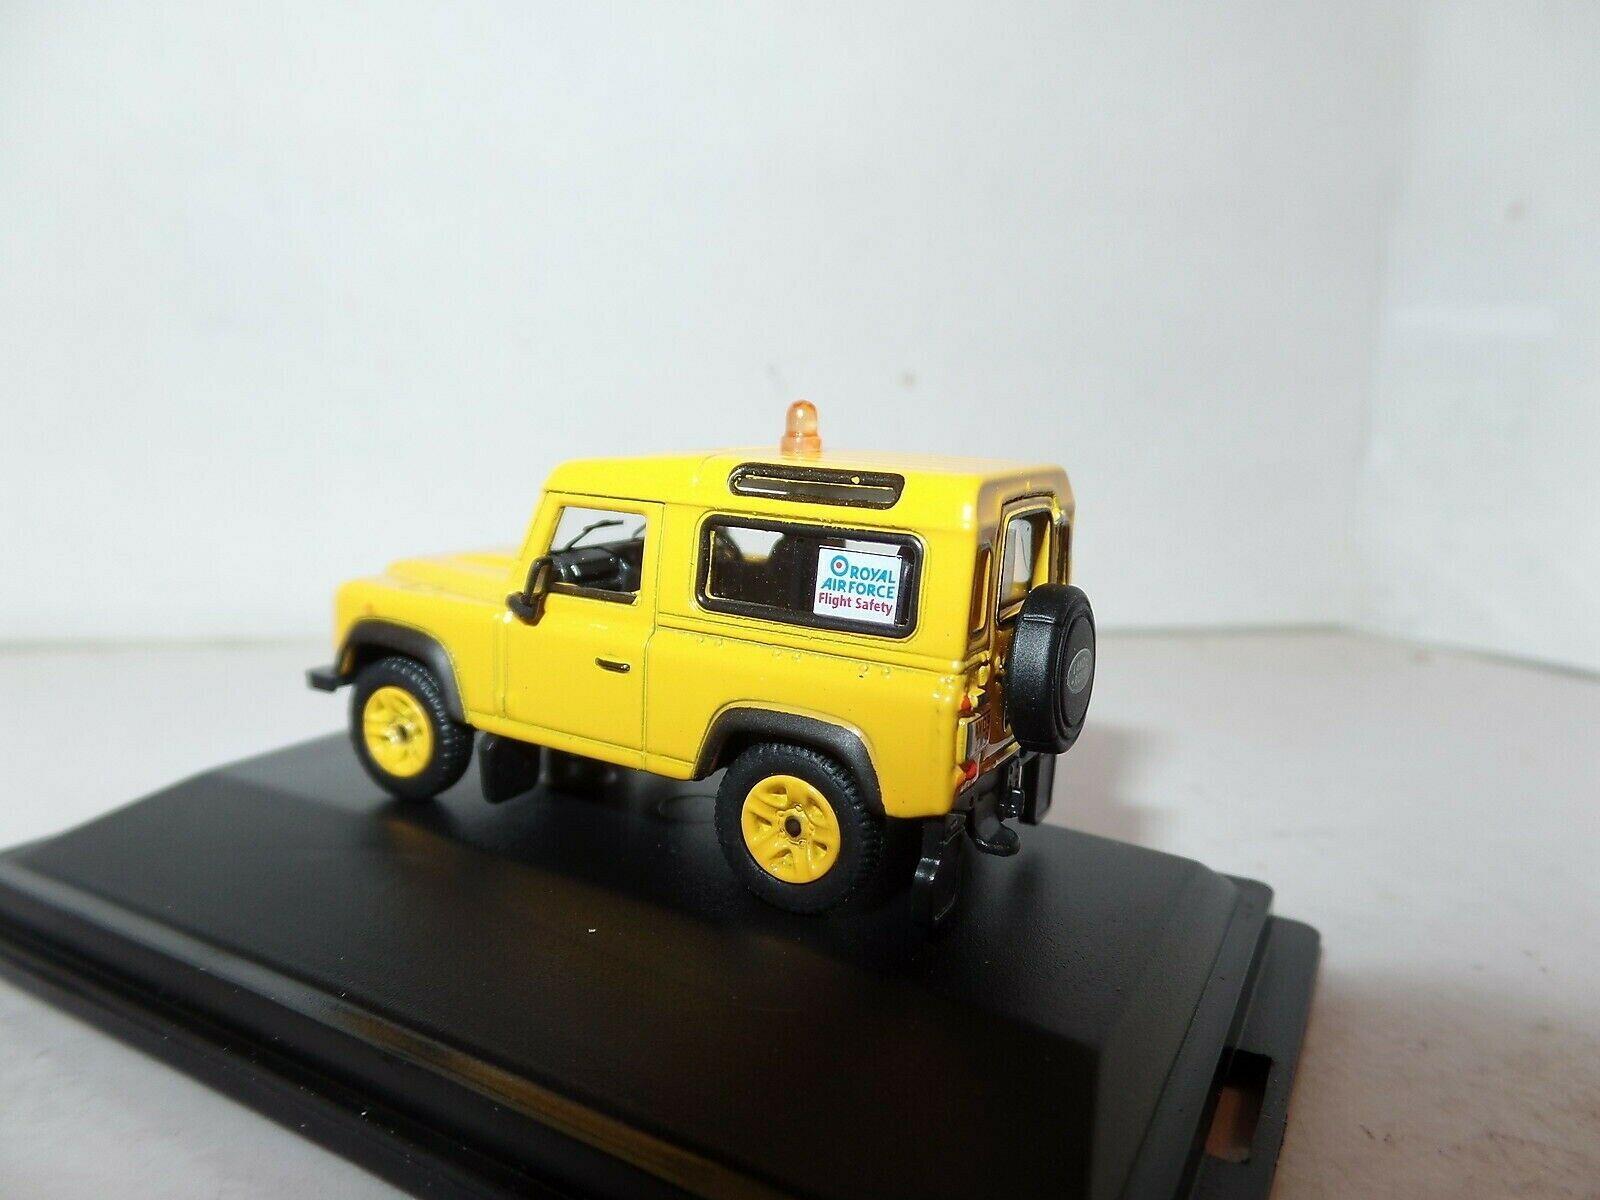 1:76 Land Rover Defender RAF Flight Safety